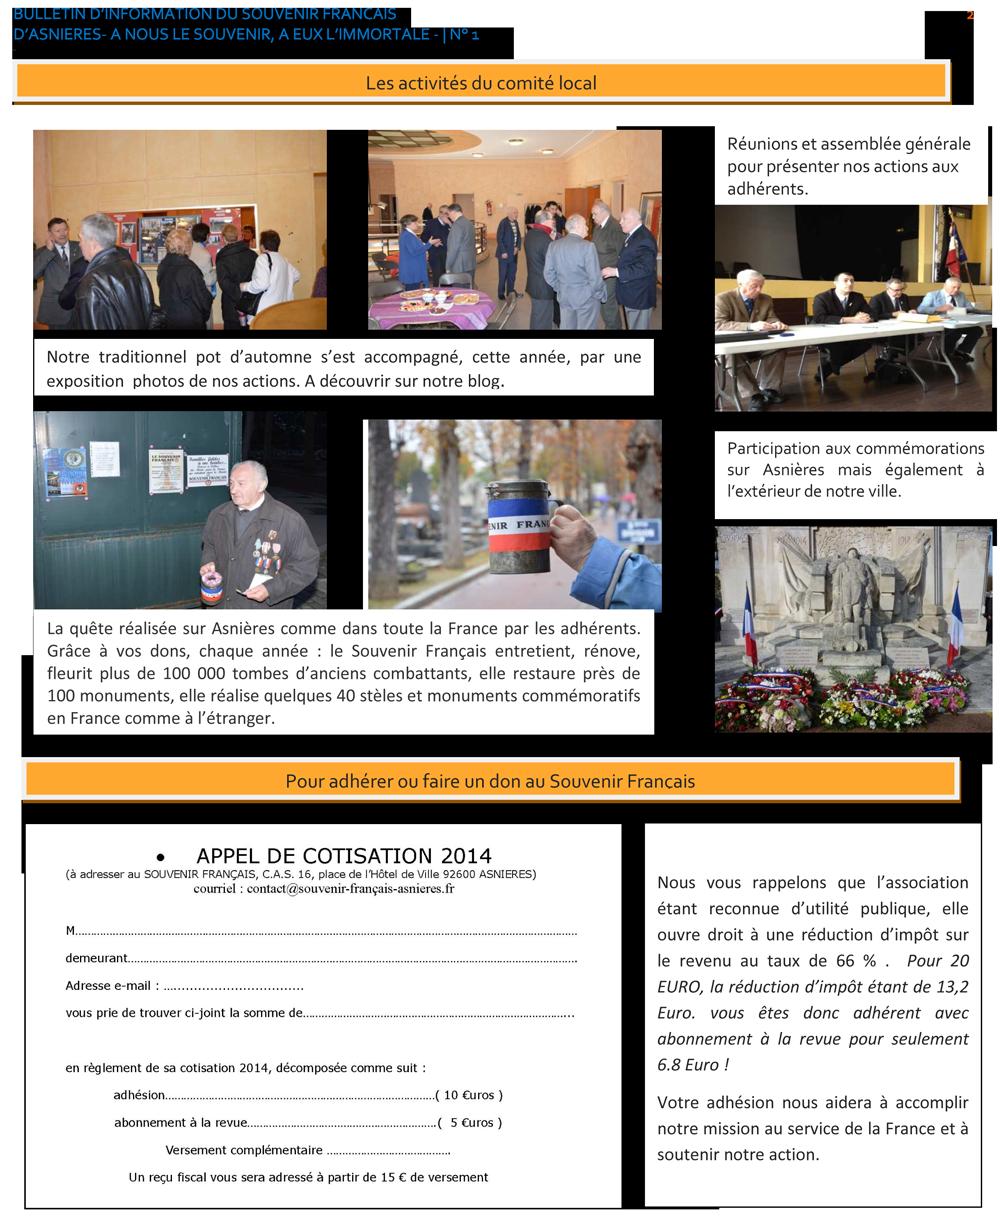 Bulletin d'information N°1 du SF d'Asnières